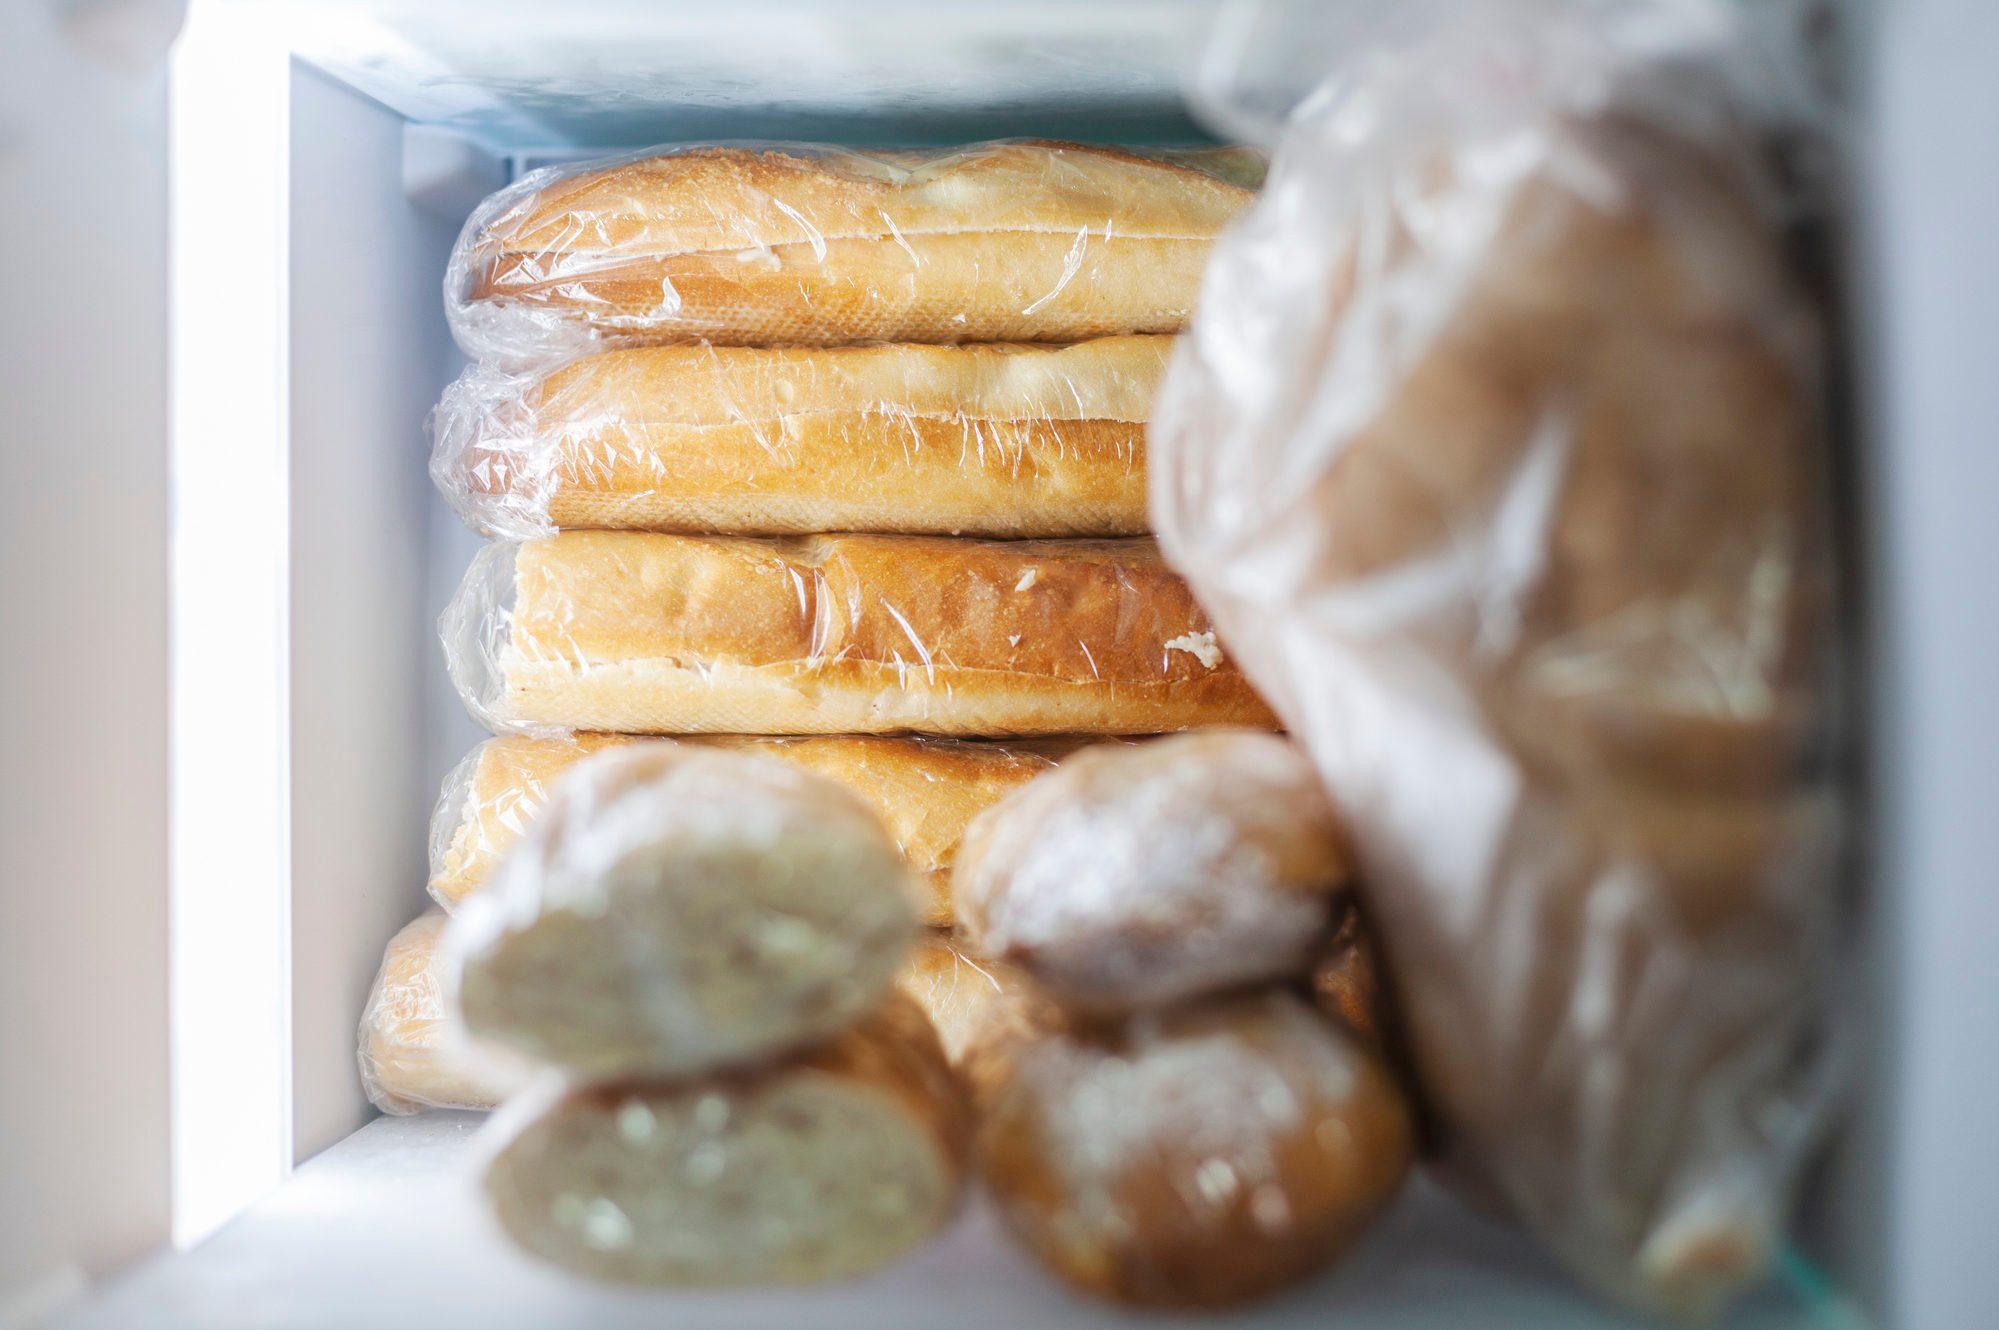 Bread stored in freezer